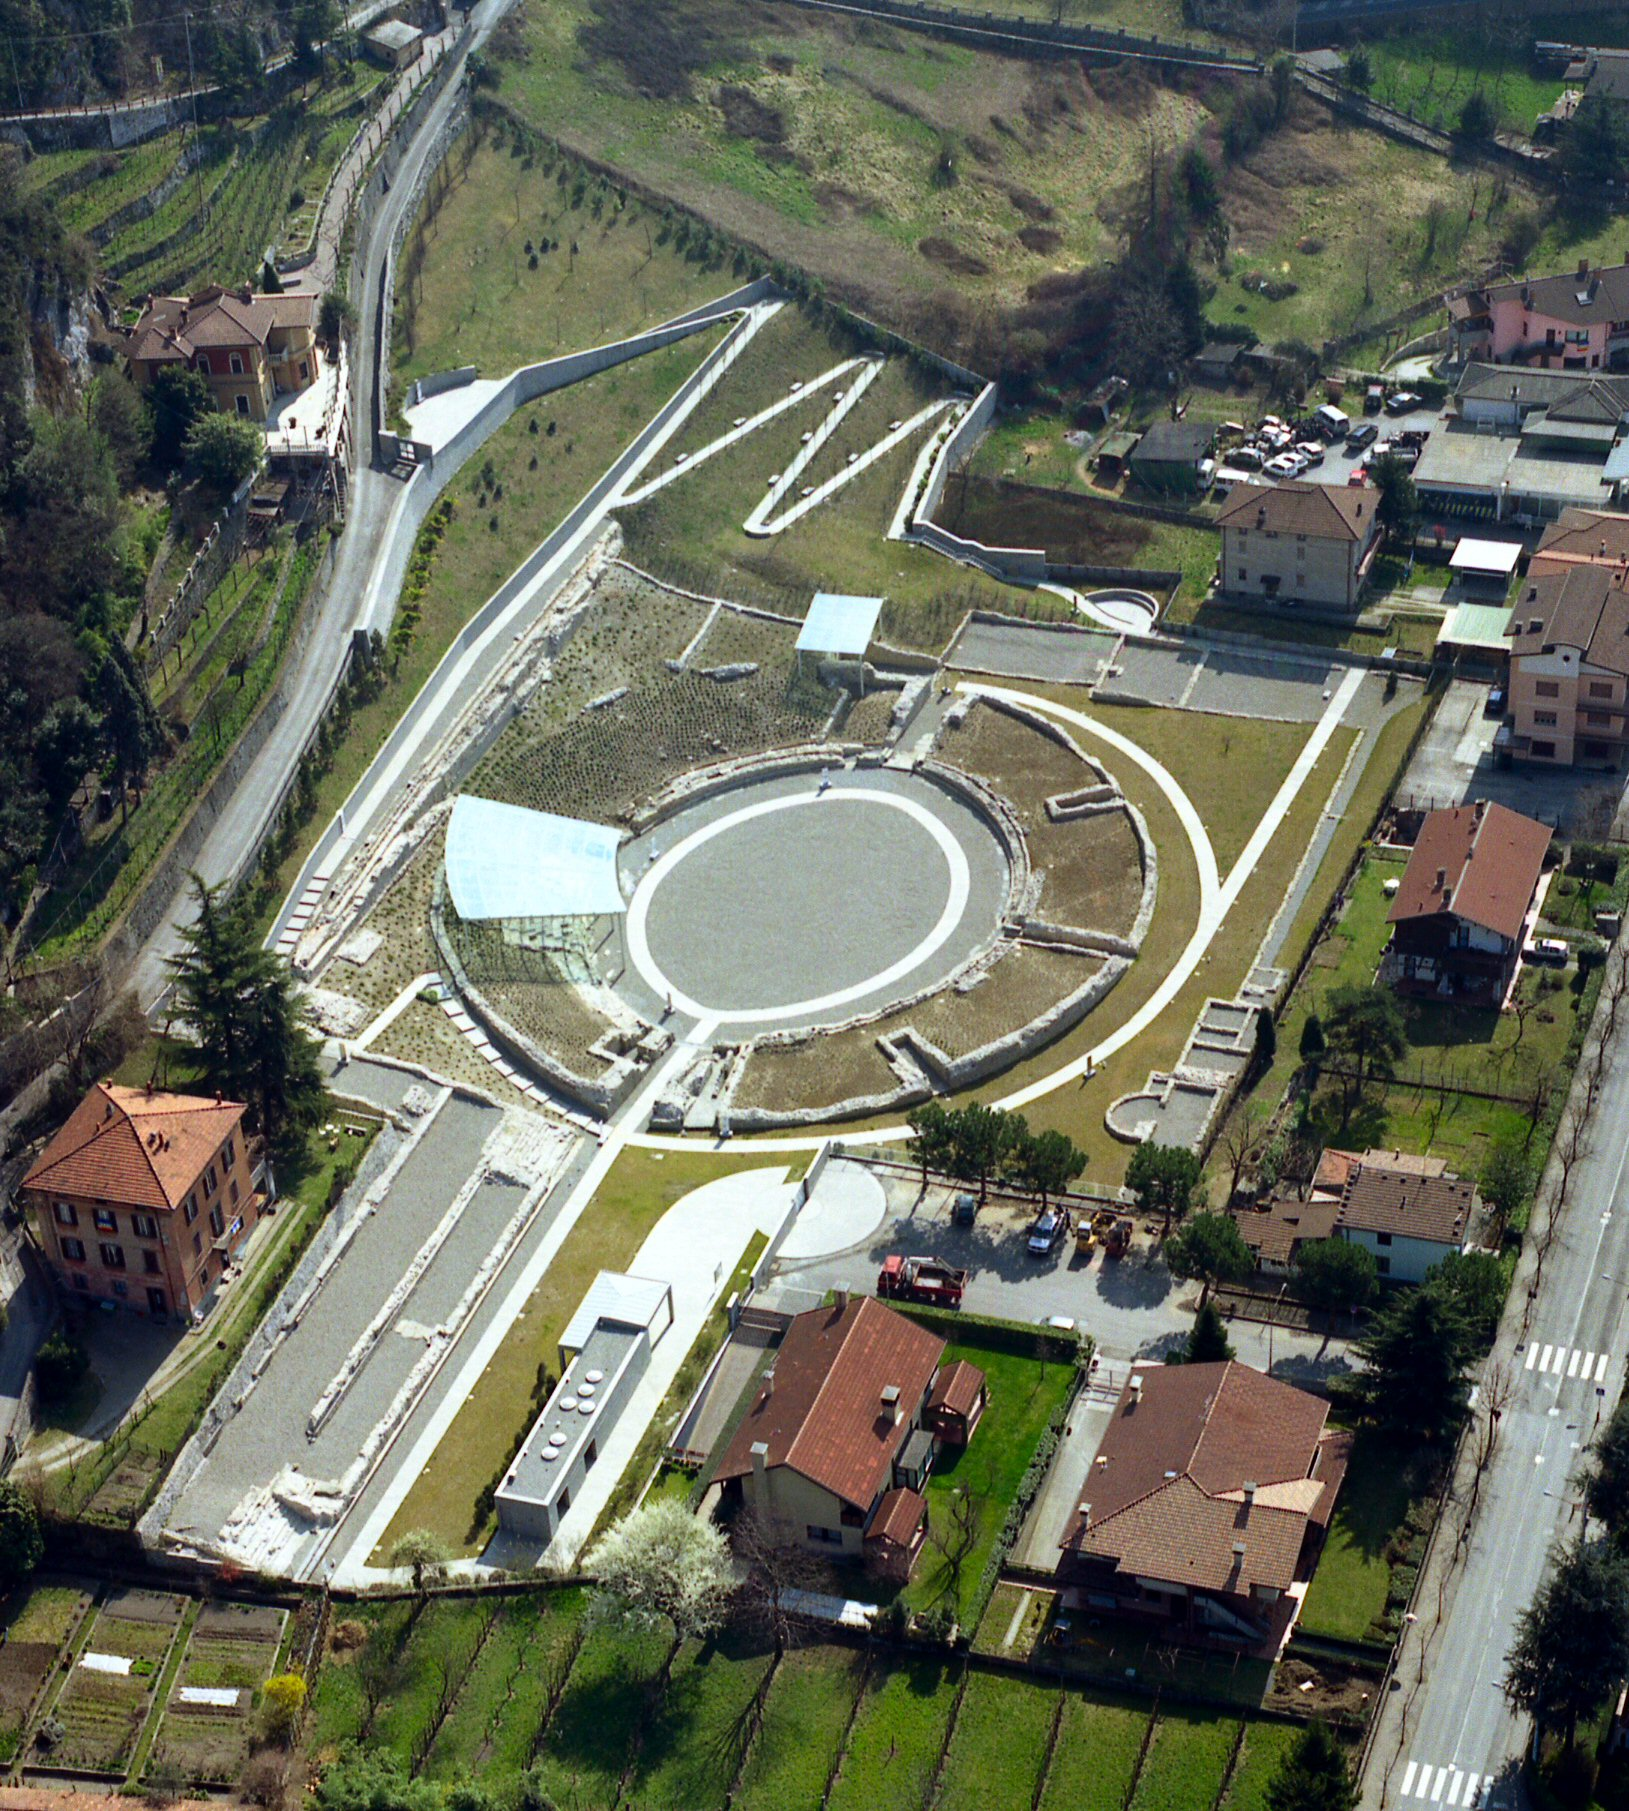 cividate-camuno_parco-archeologico-teatro-e-anfiteatro_foto-drm-lombardia